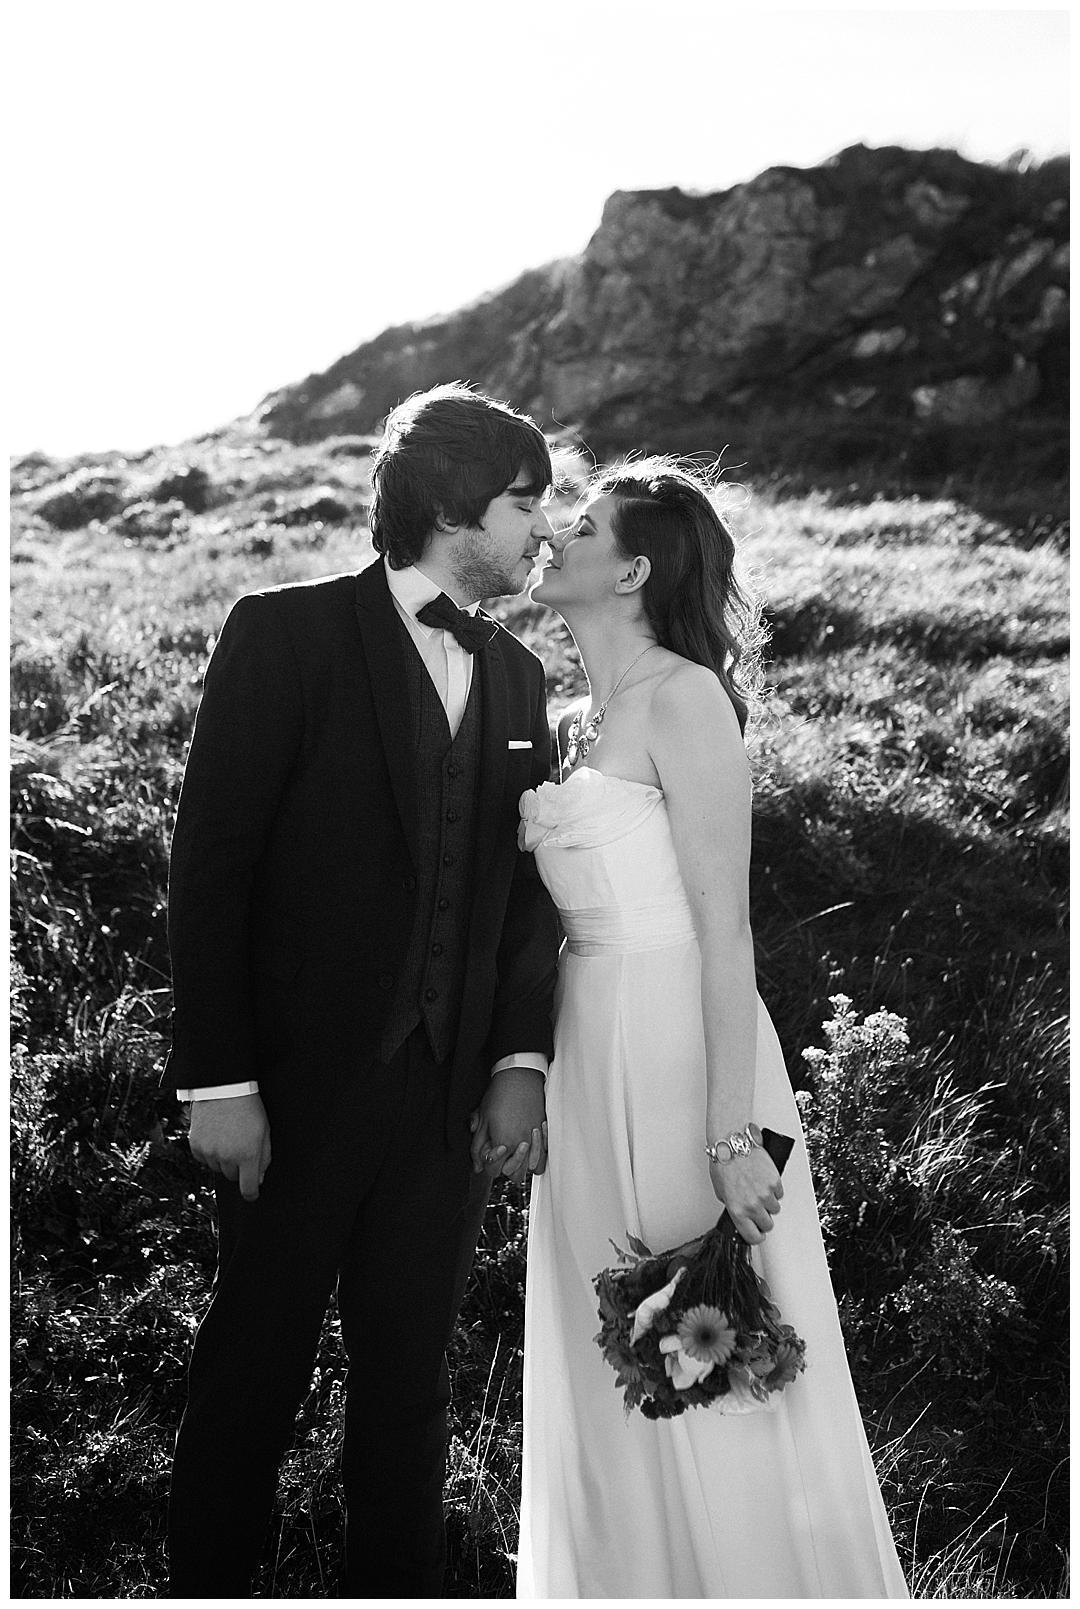 We_can _be_Heroes_alternative_wedding_photographer_Ireland_0057